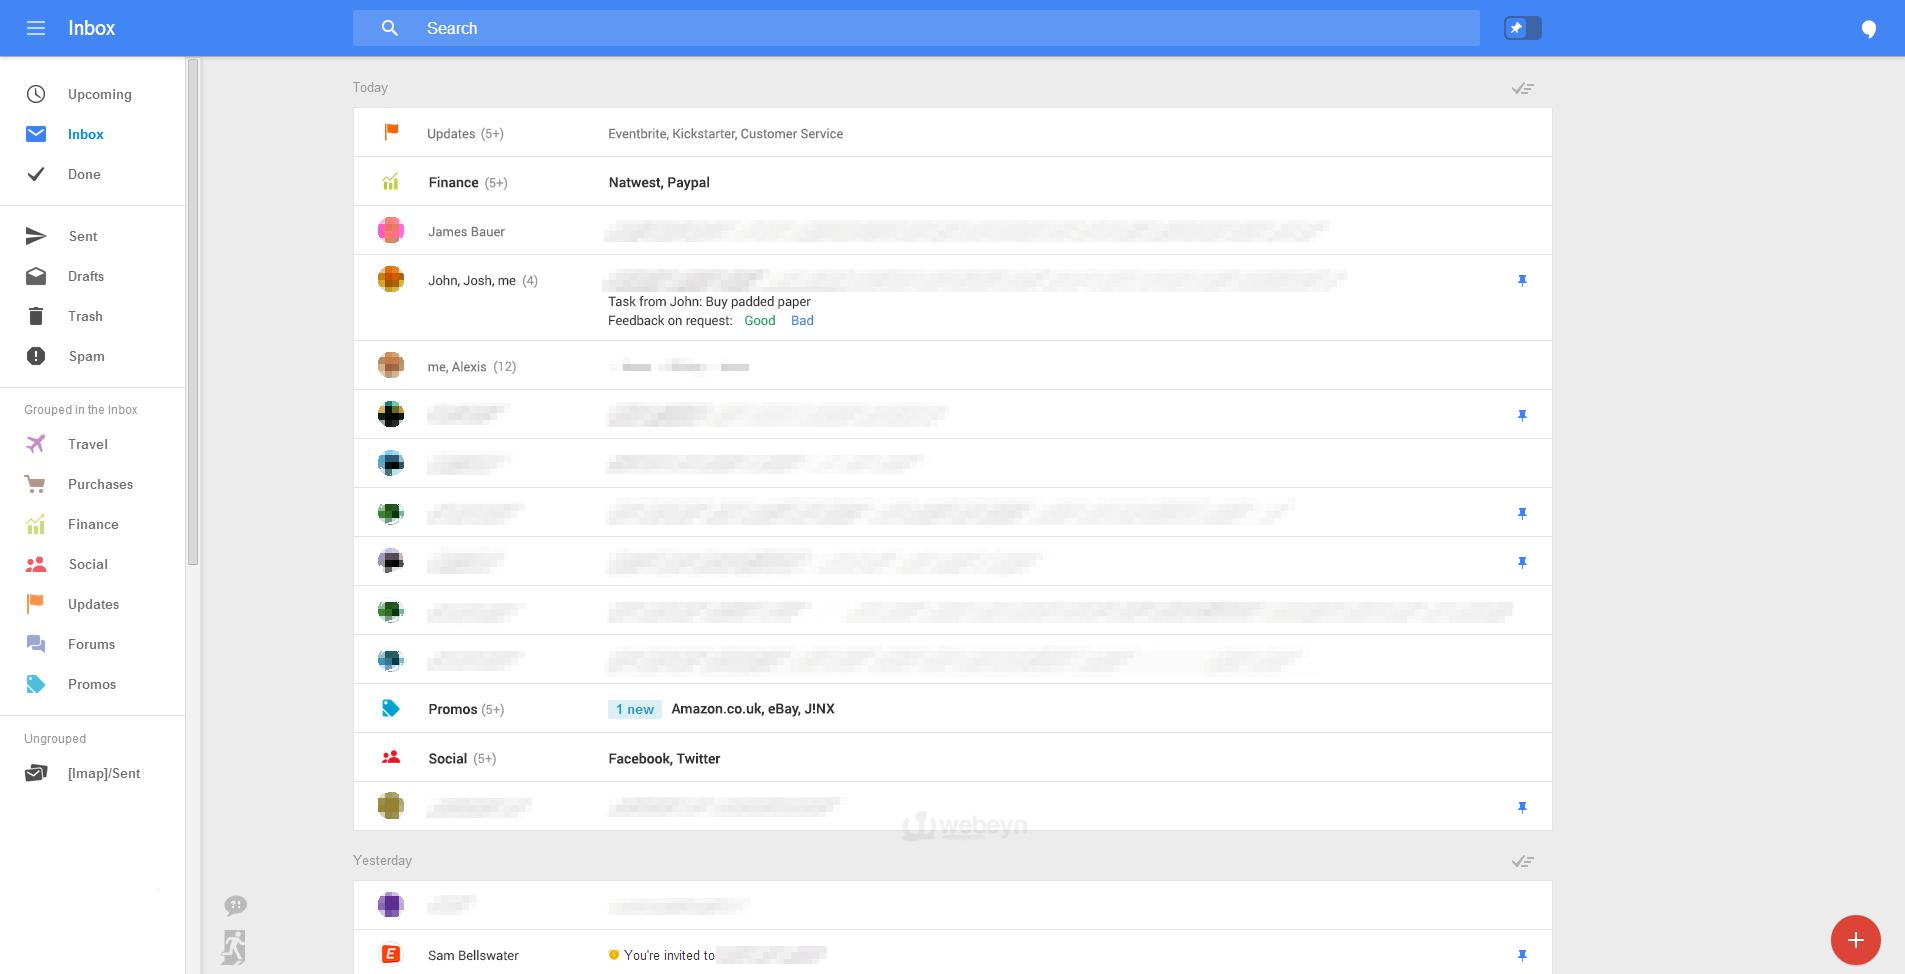 Yeni-Gmail-arayuzu-webeyn-1